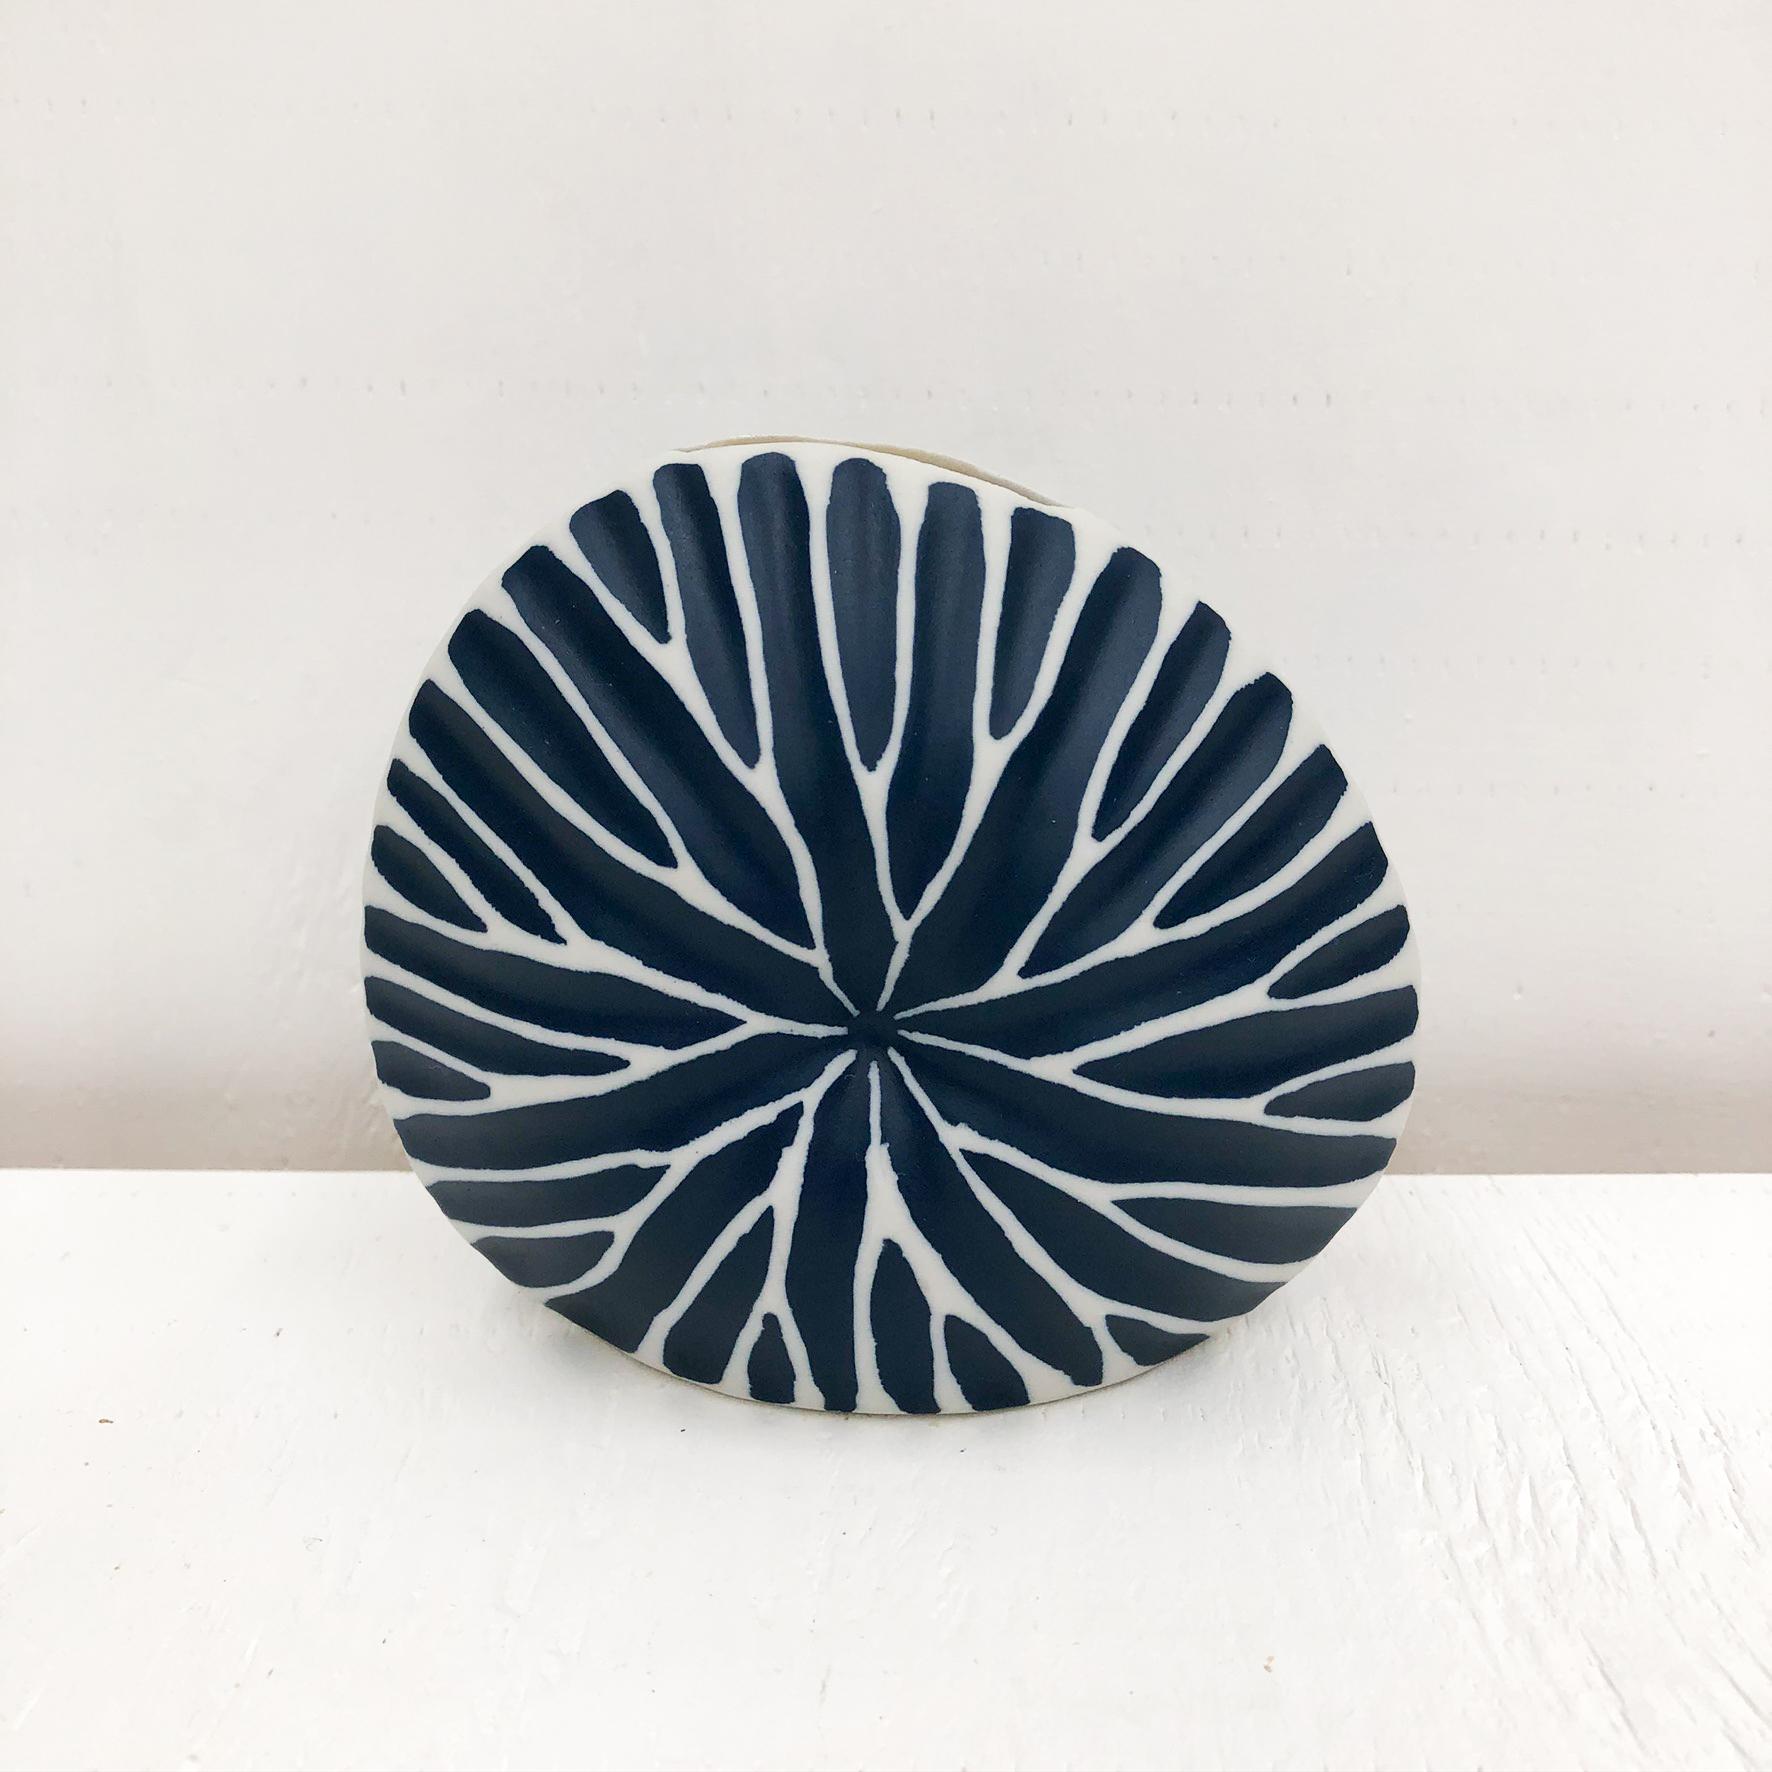 Diva Round Mini S Handmade Vase - Blue